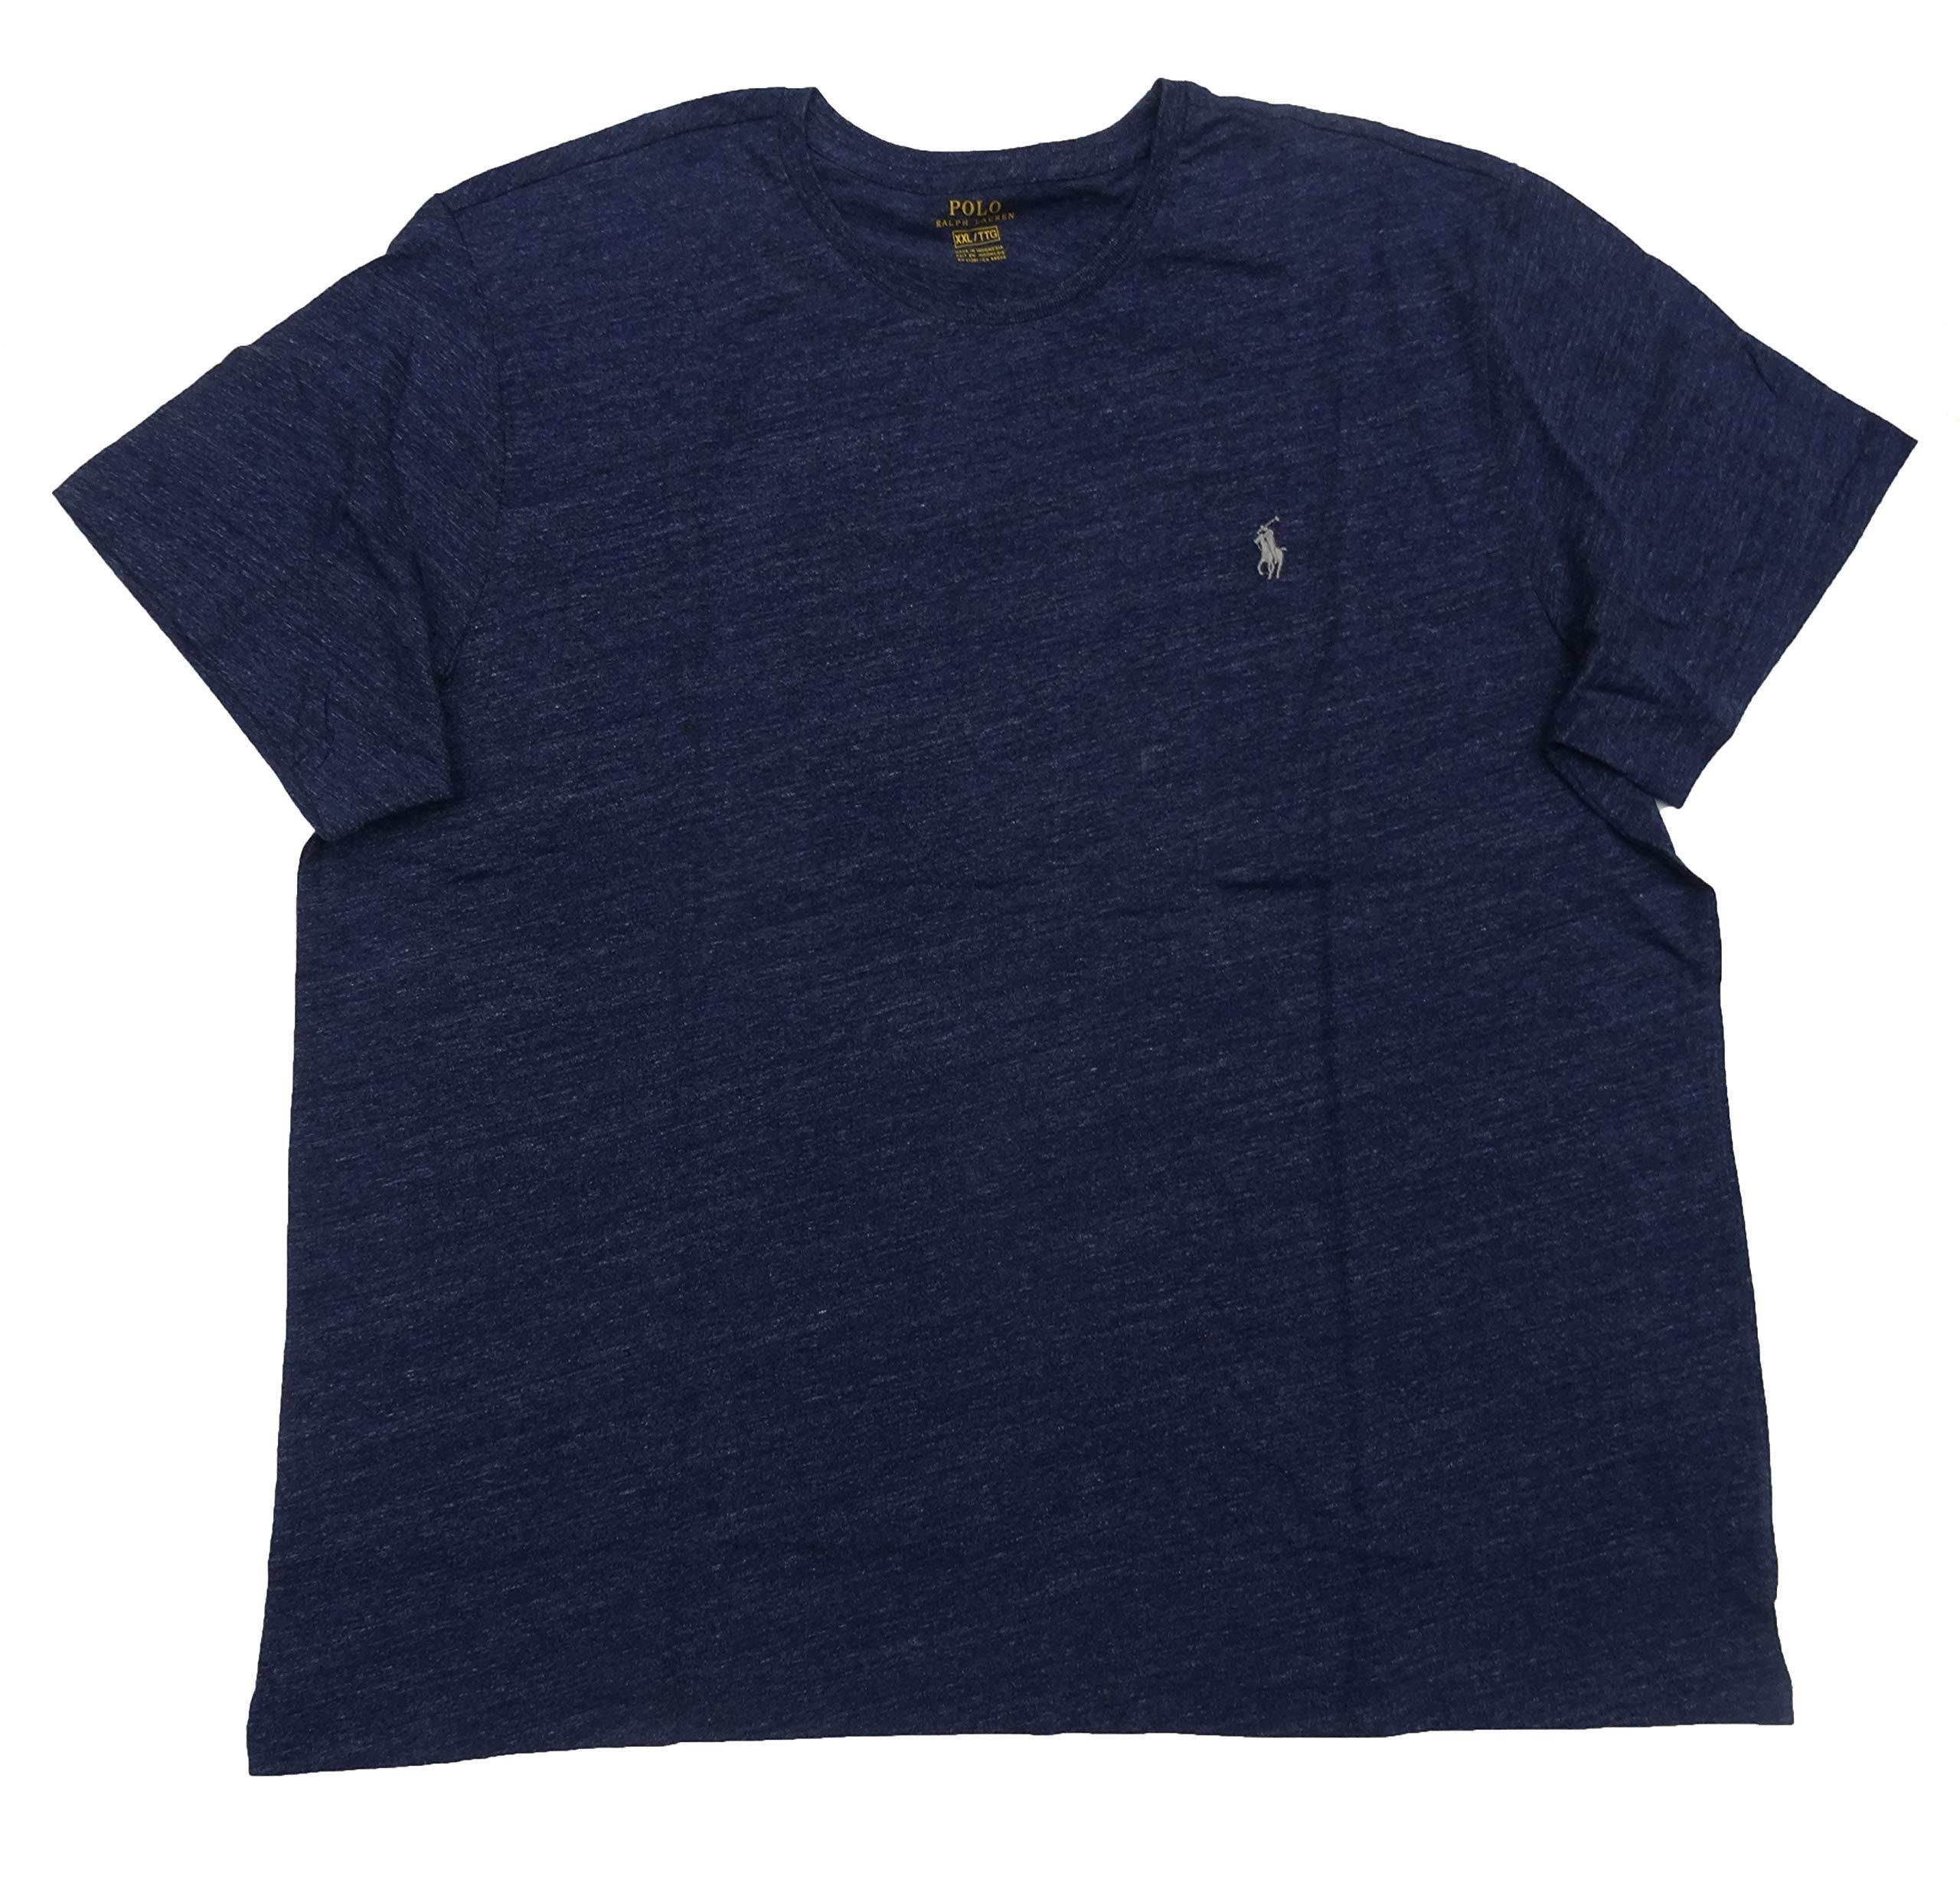 Polo Ralph Lauren Men's Big & Tall Pony Logo Crew Neck Jersey T-Shirt (2X Big, Blue Heather - Silver Pony)